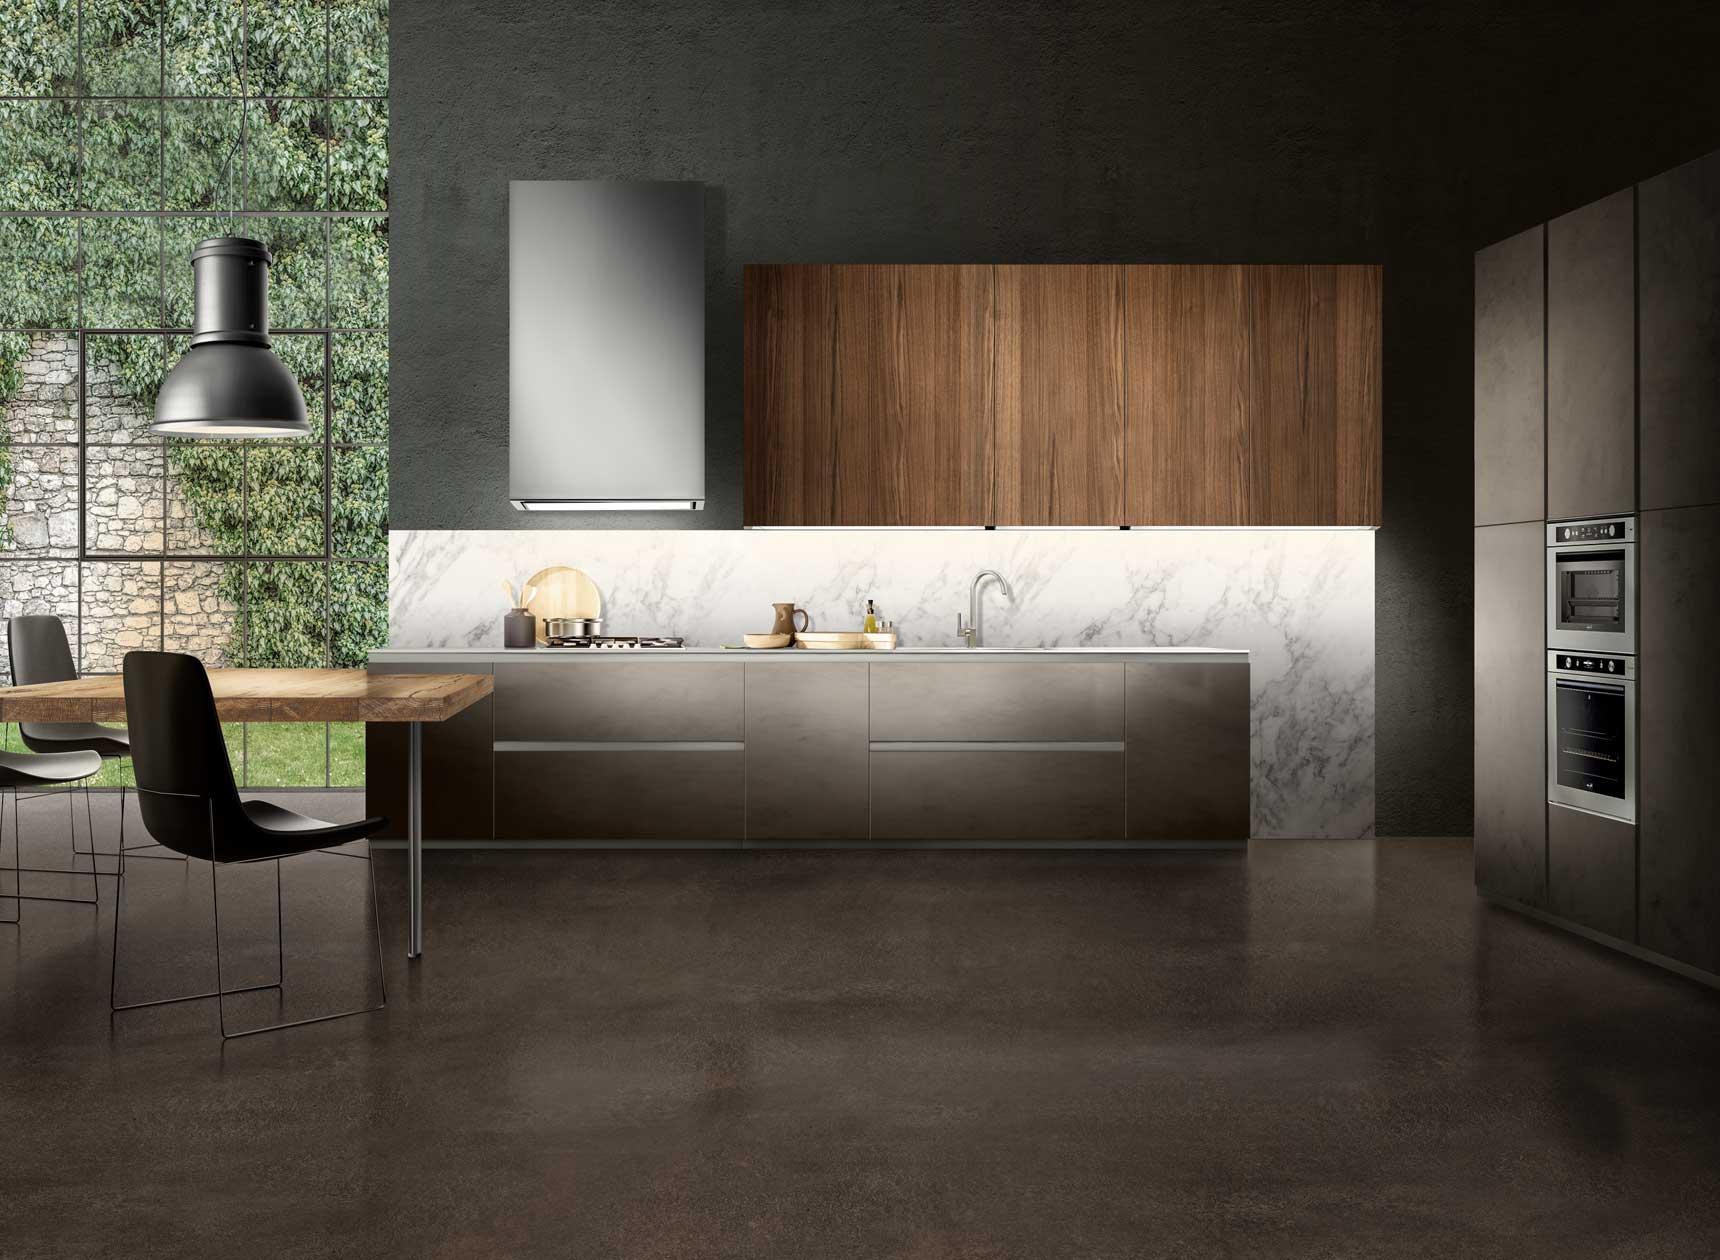 French Cabinetry Premium European Kitchen Cabinet Design